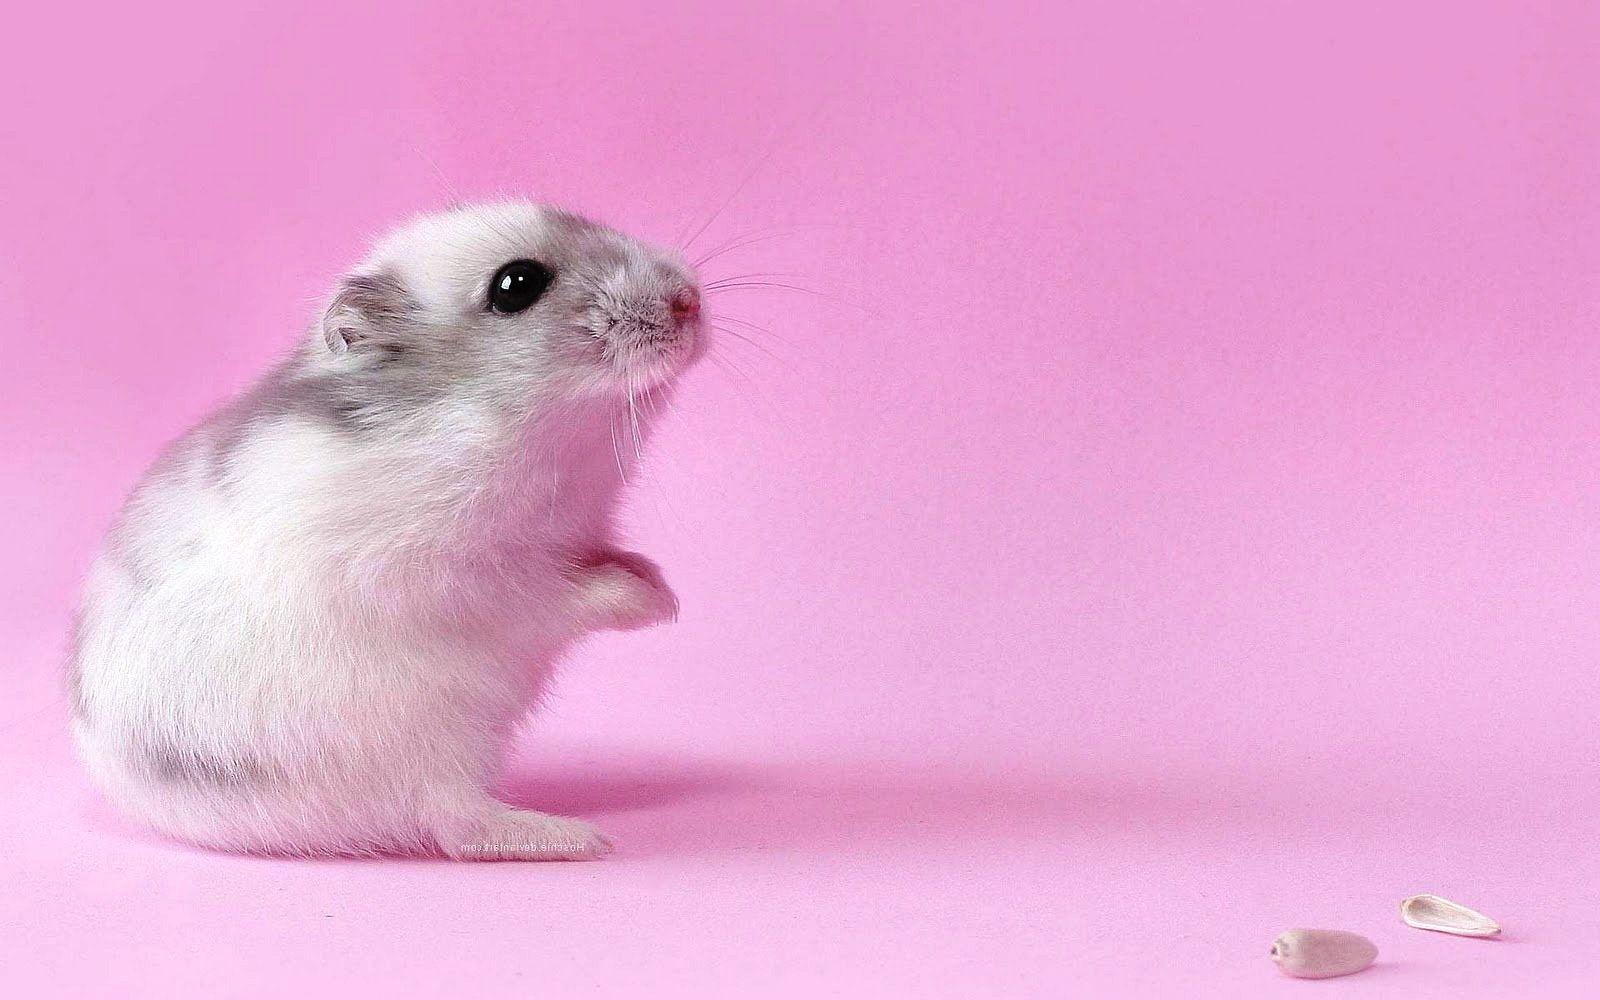 ideas about hamster wallpaper on pinterest hamsters, cute 1600